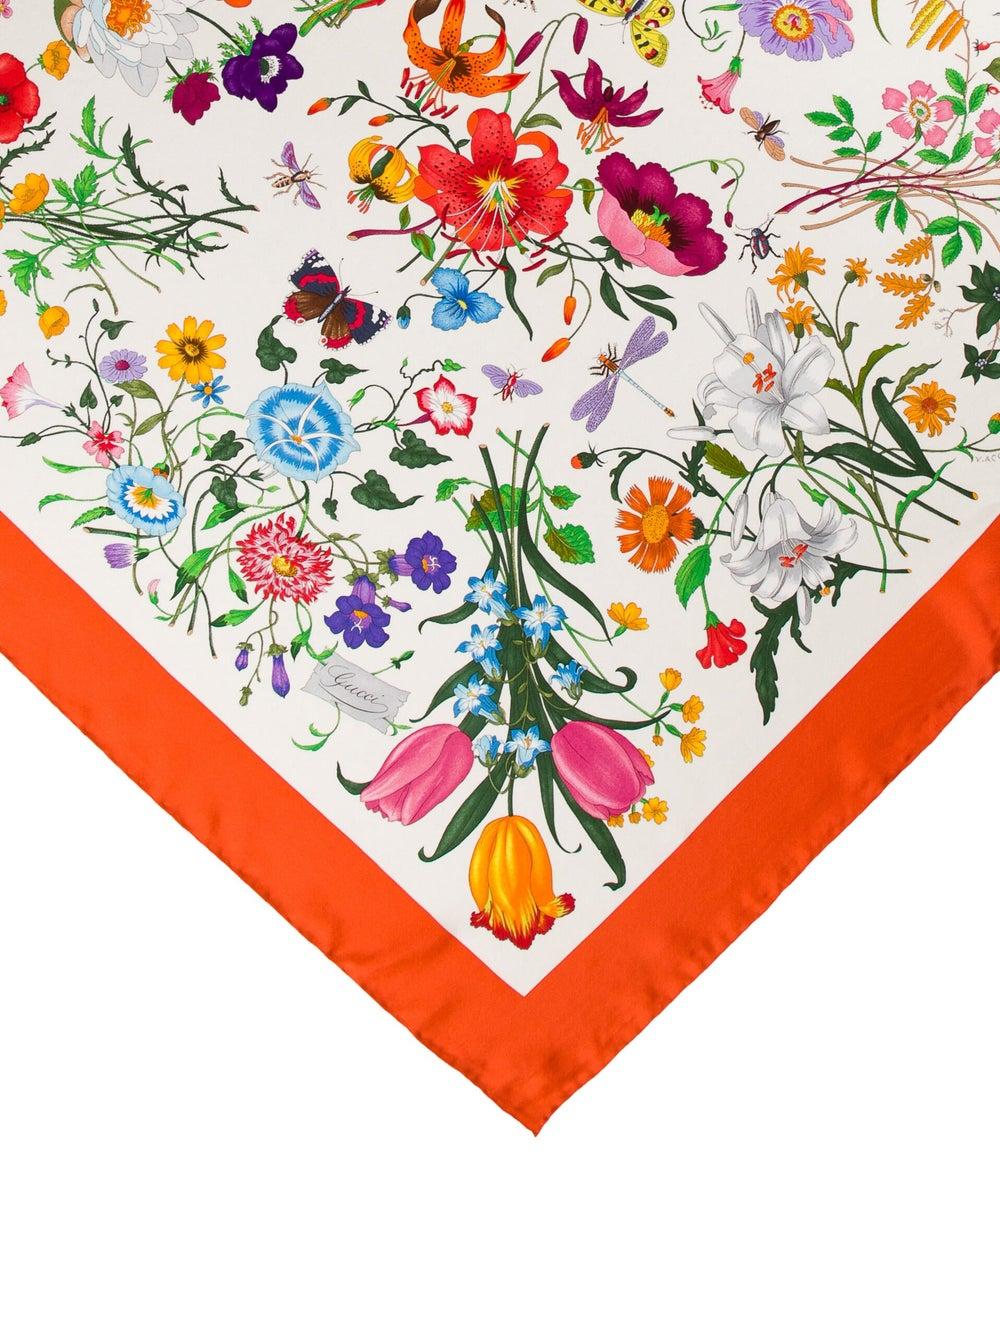 Gucci Silk Floral Print Scarf - image 2